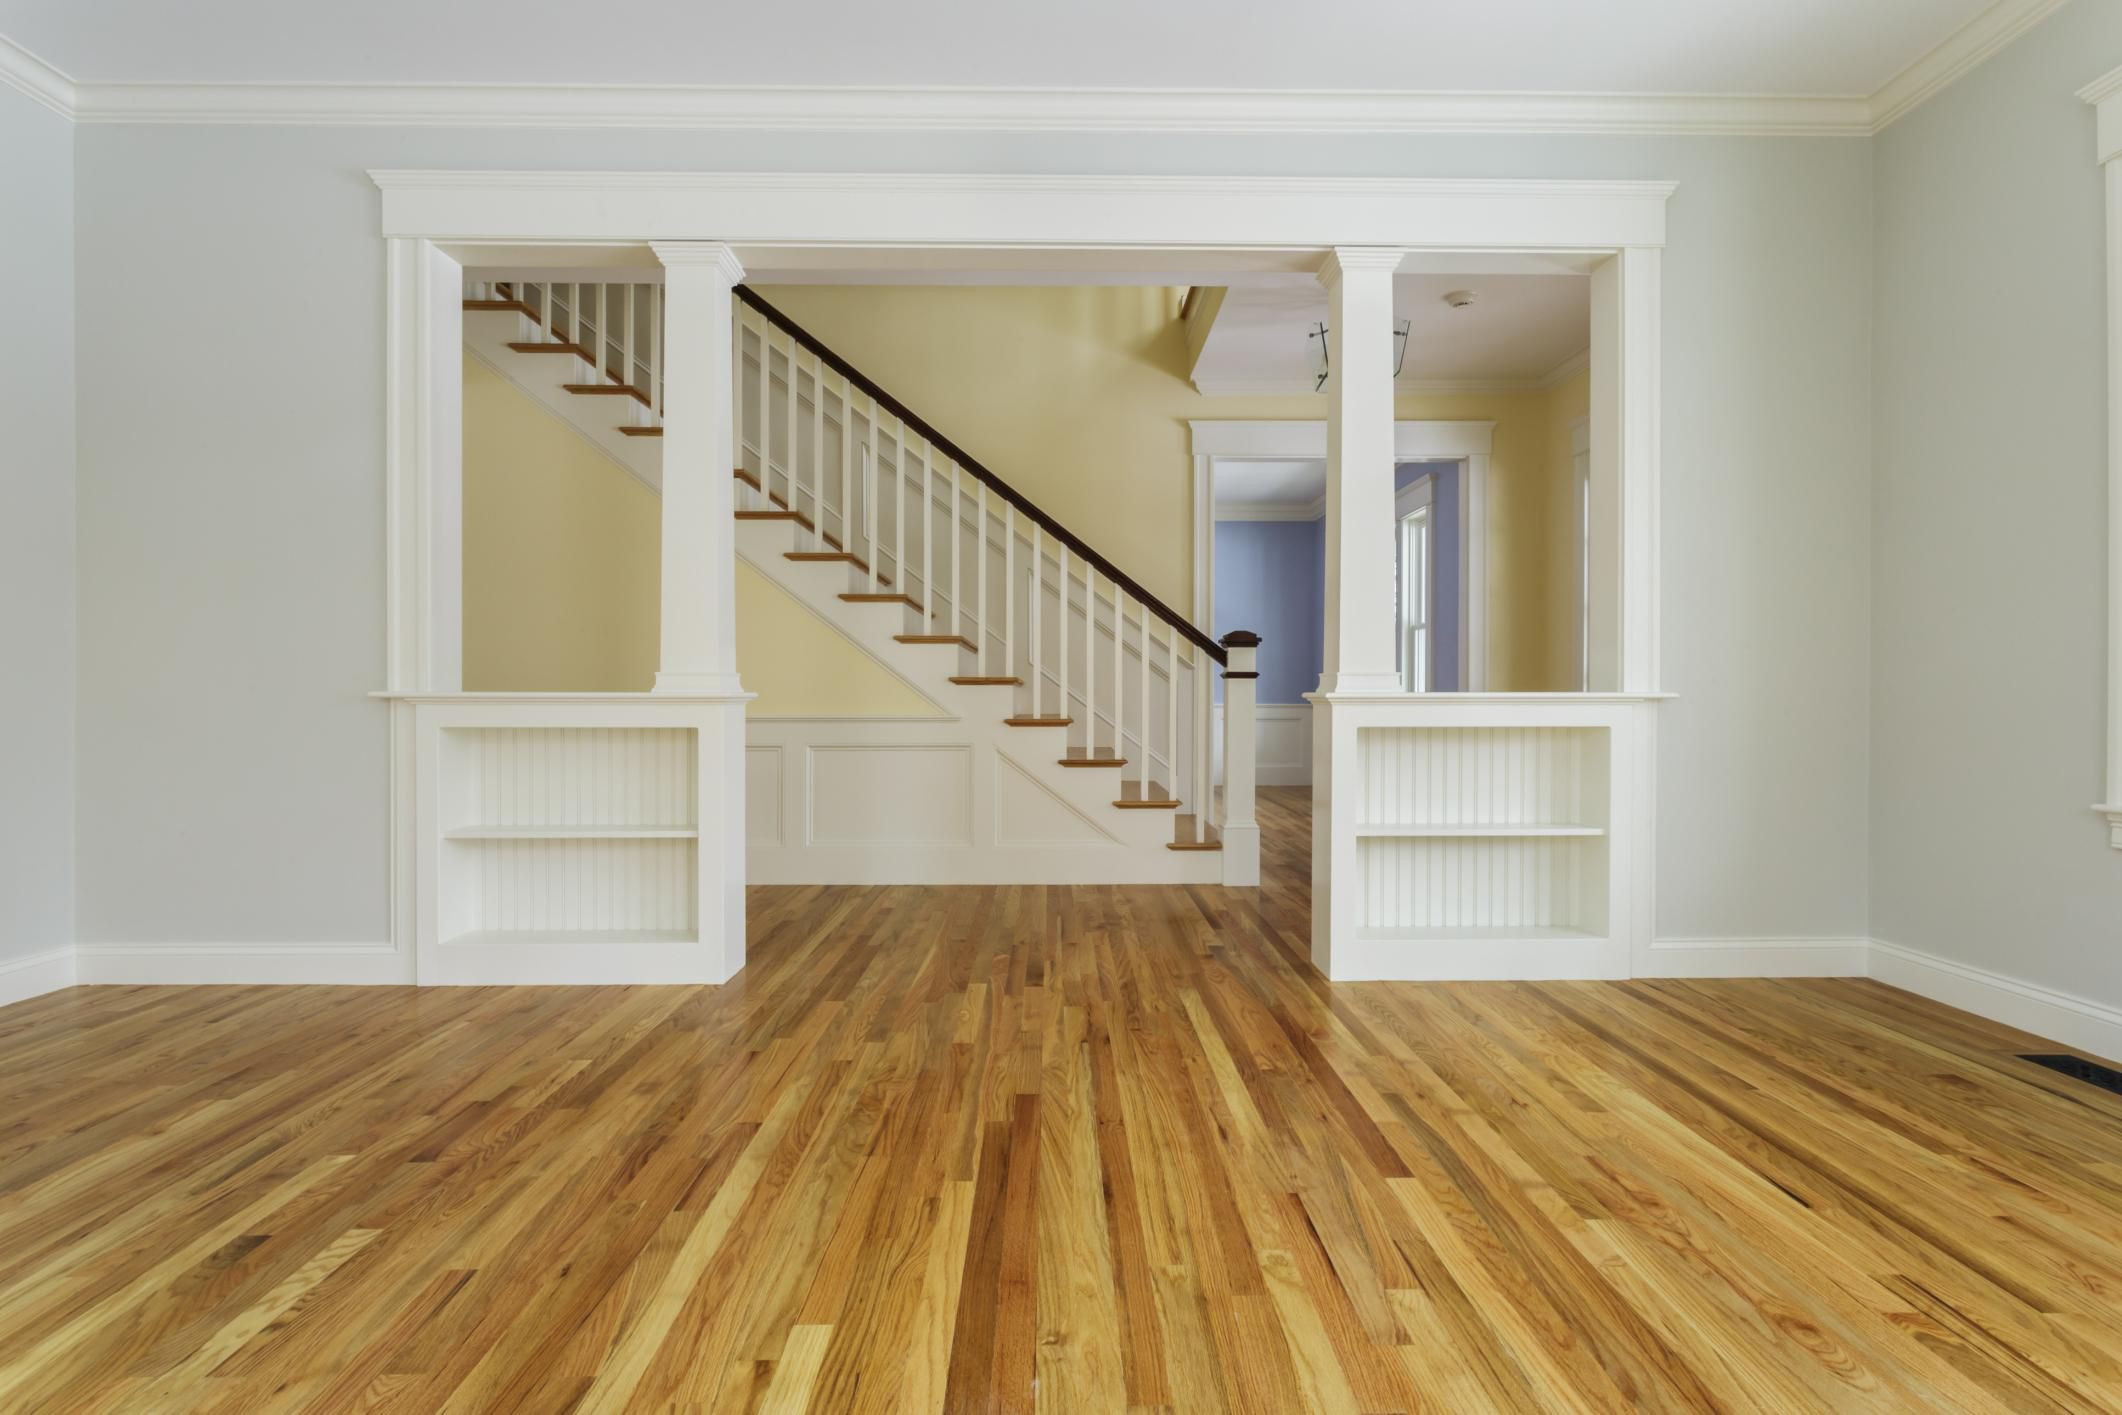 preparing hardwood floors for refinishing of guide to solid hardwood floors inside 168686571 56a49f213df78cf772834e24